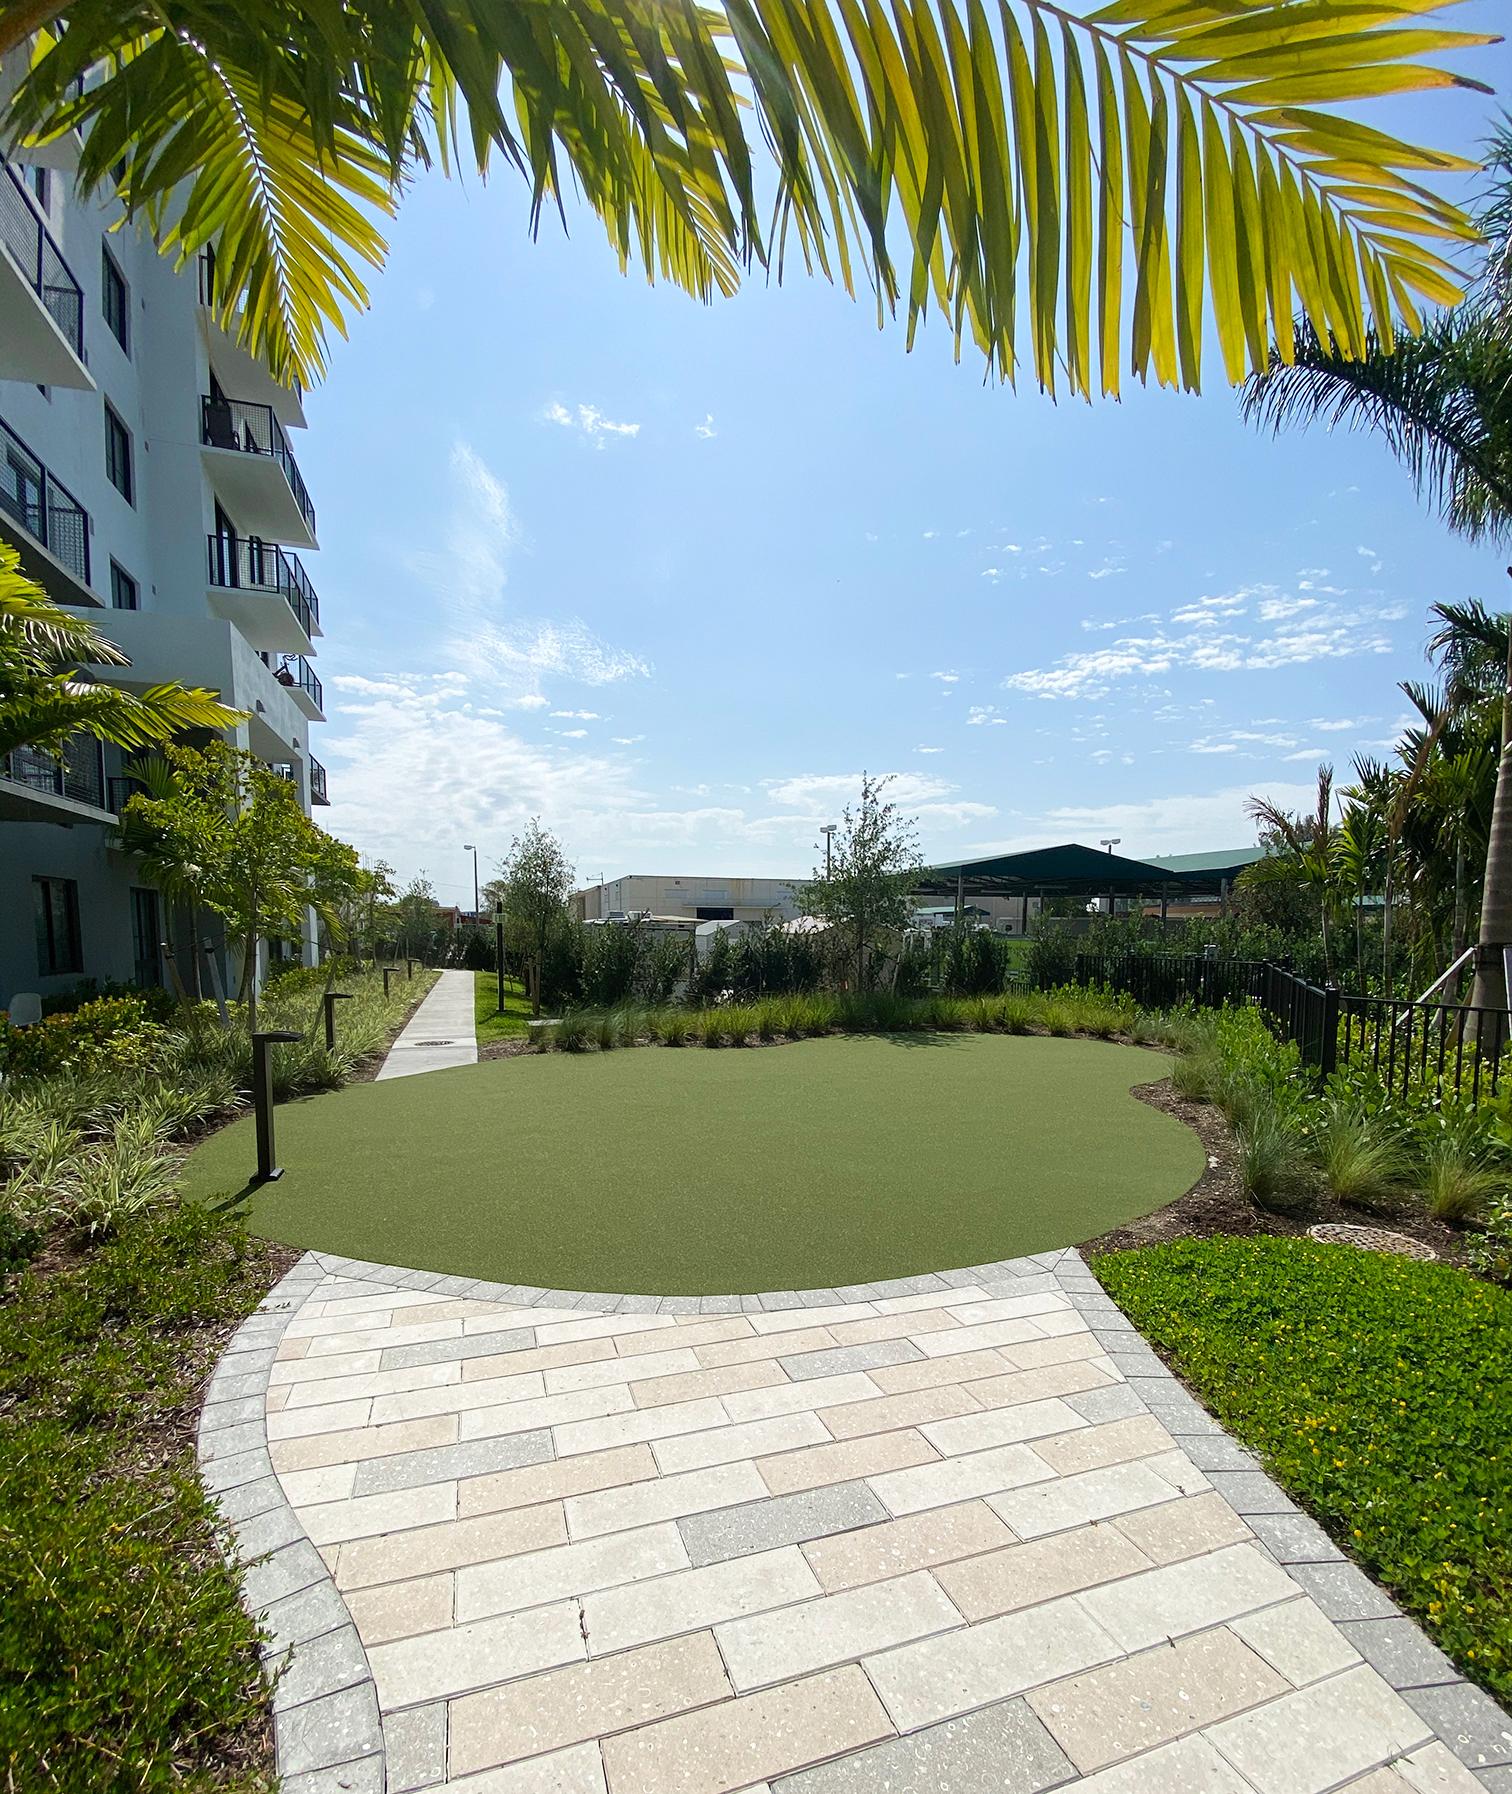 Yoga Lawn at Sanctuary Doral